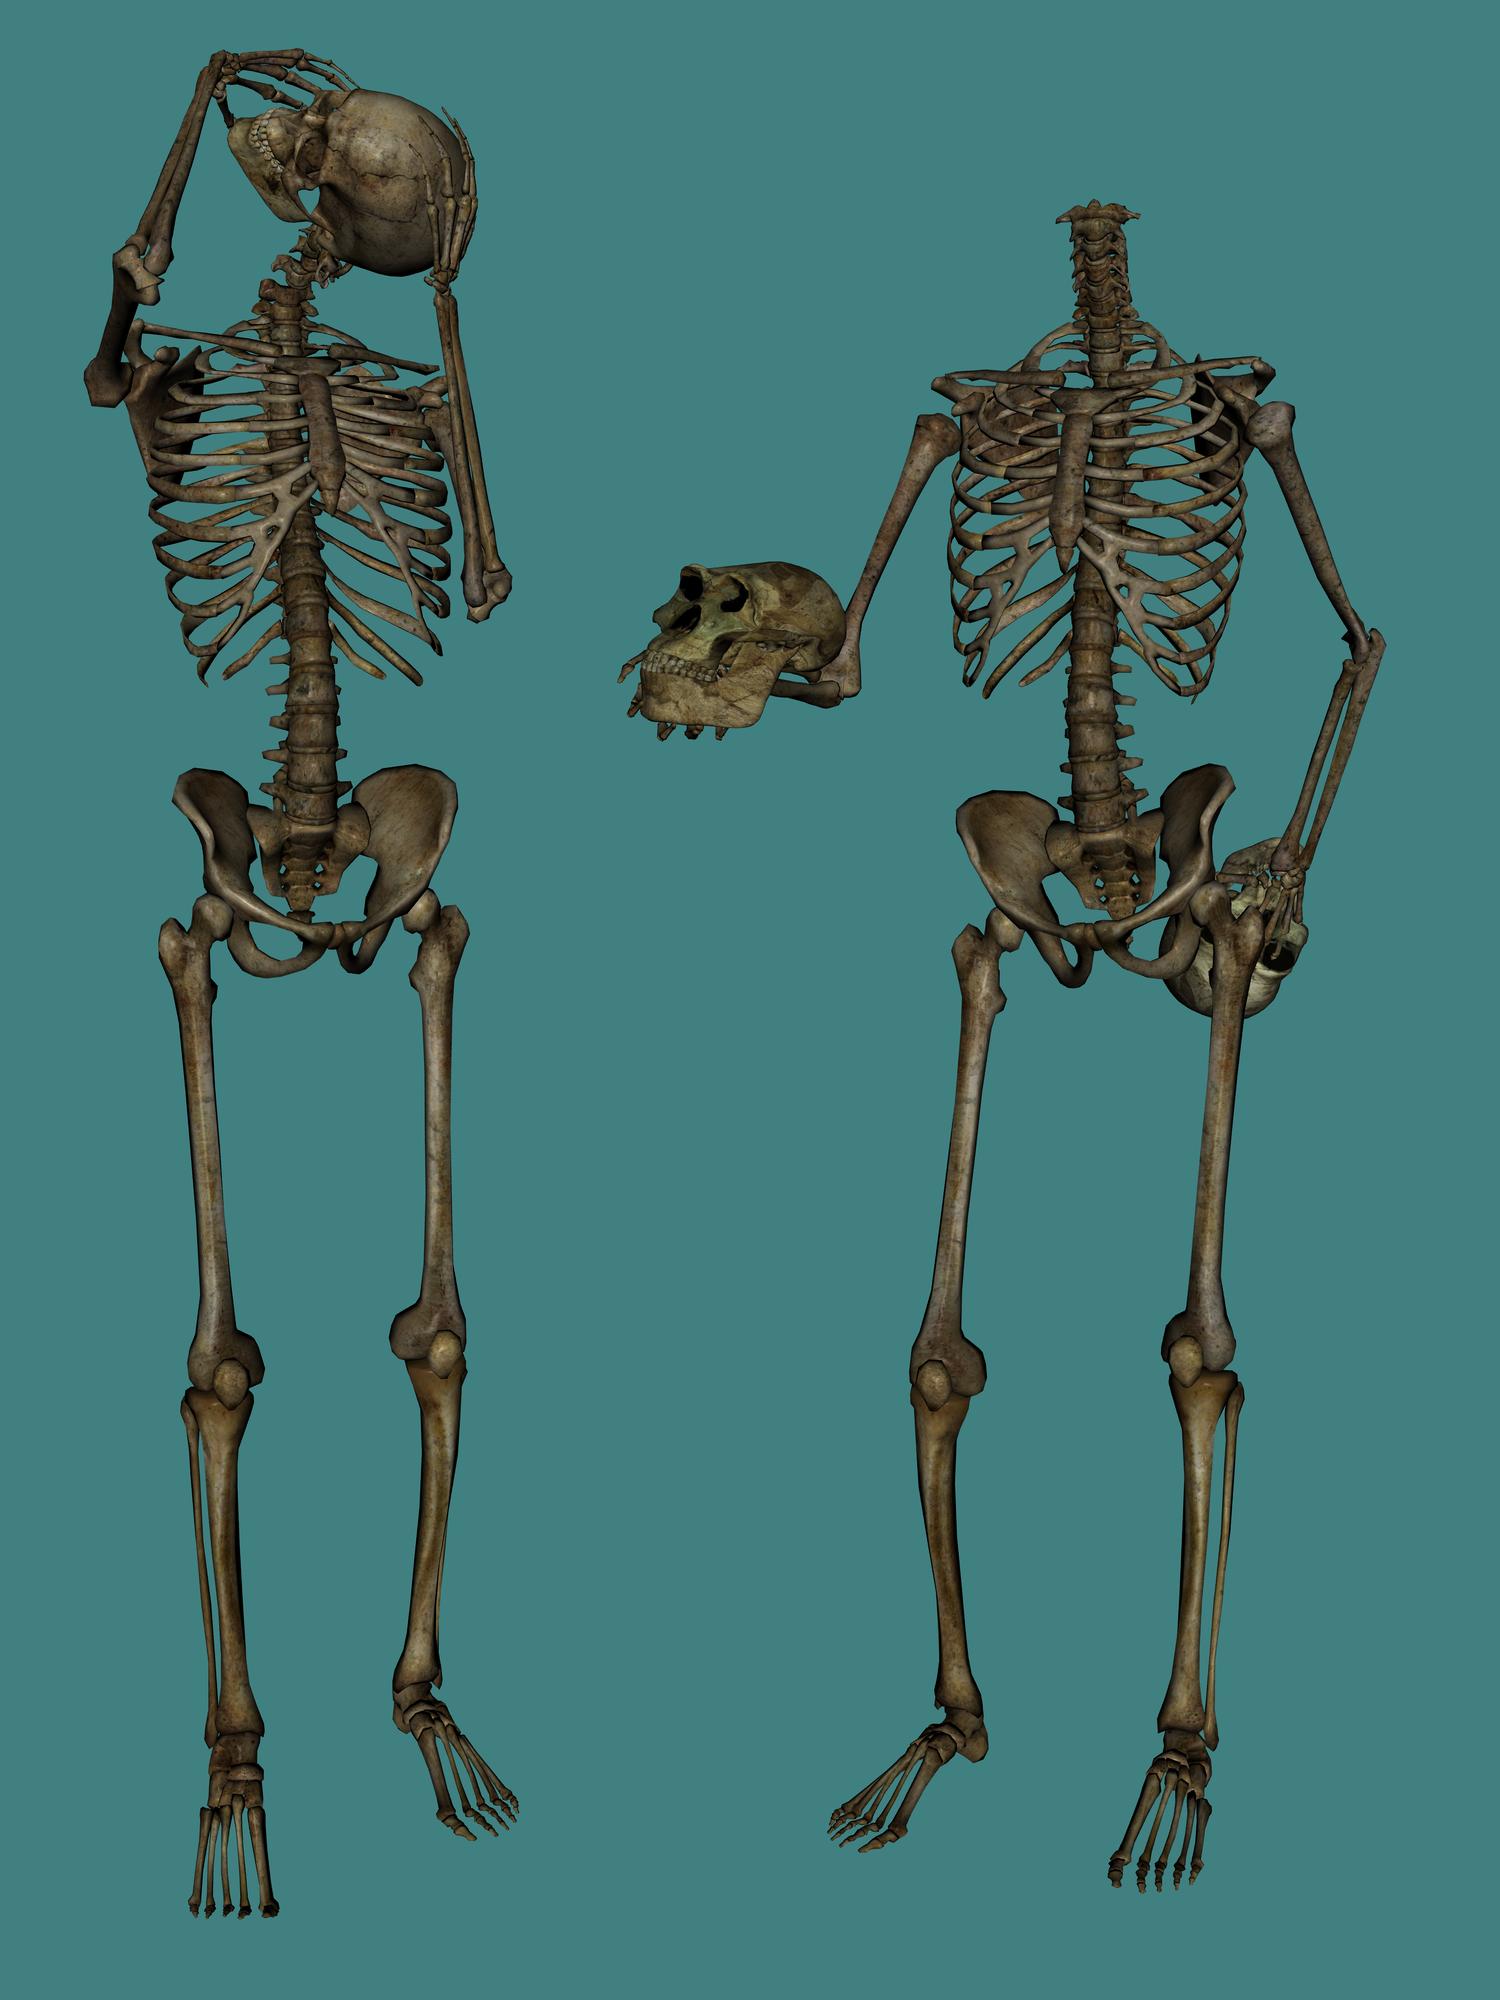 Skeleton skull image purepng. Png stock images